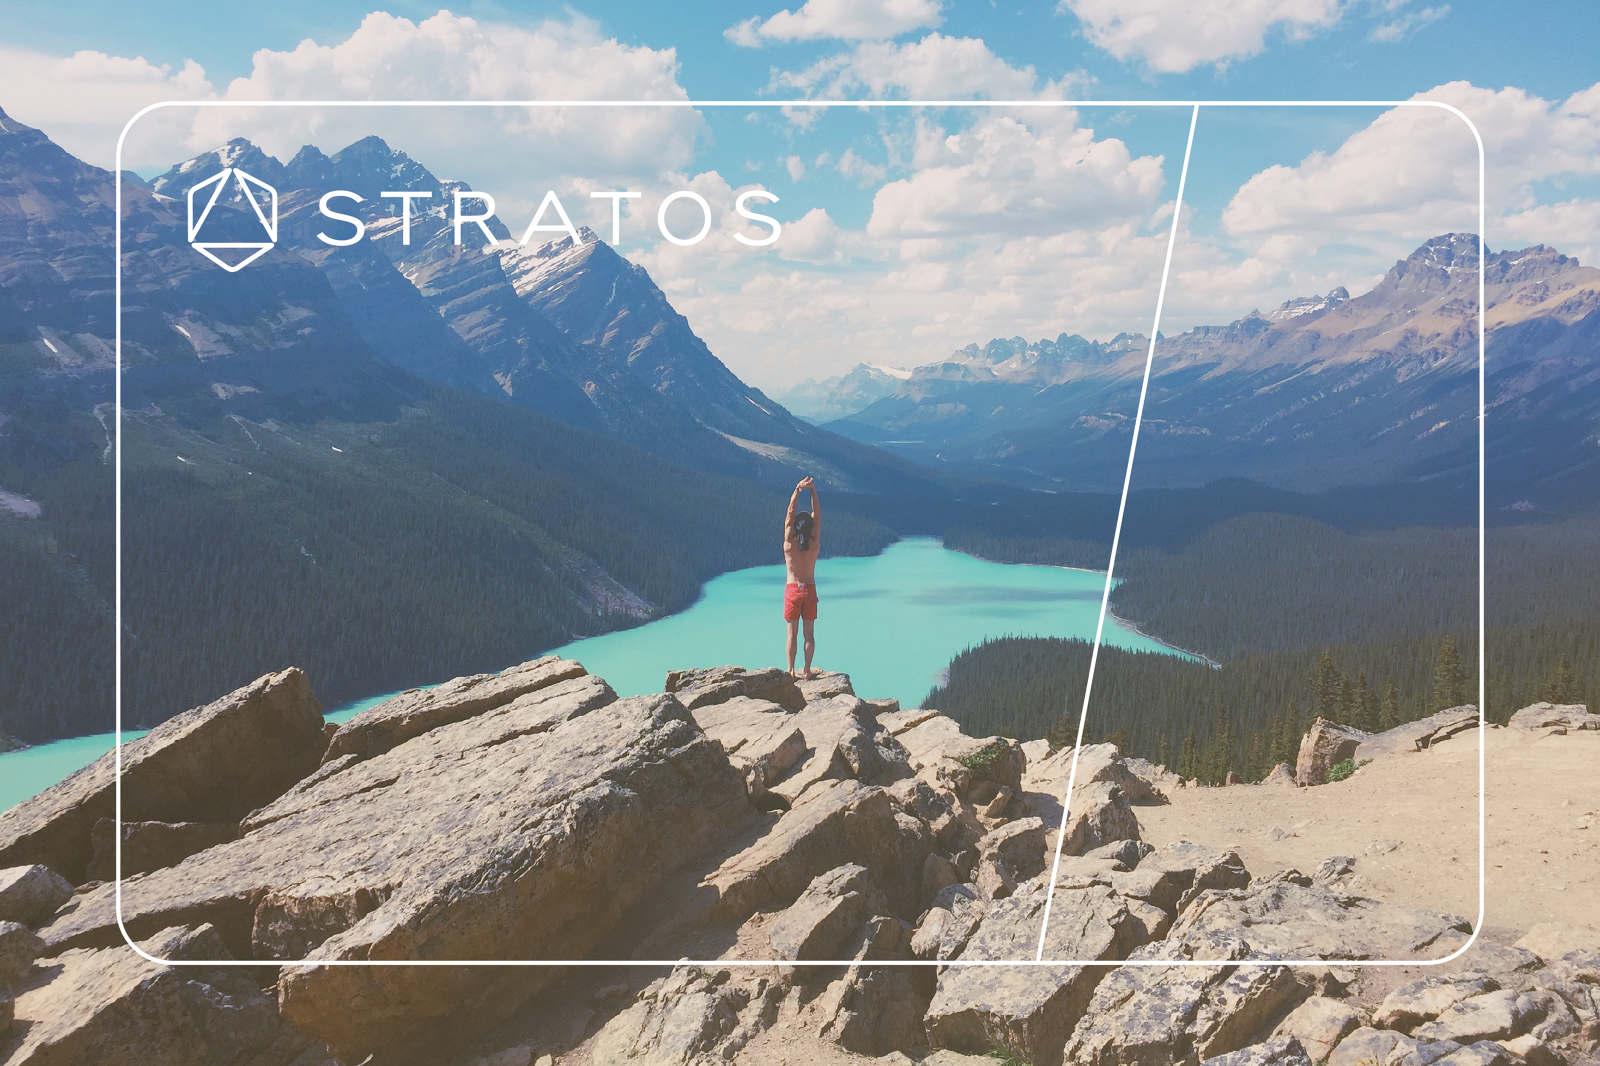 Stratos Card Ad Design